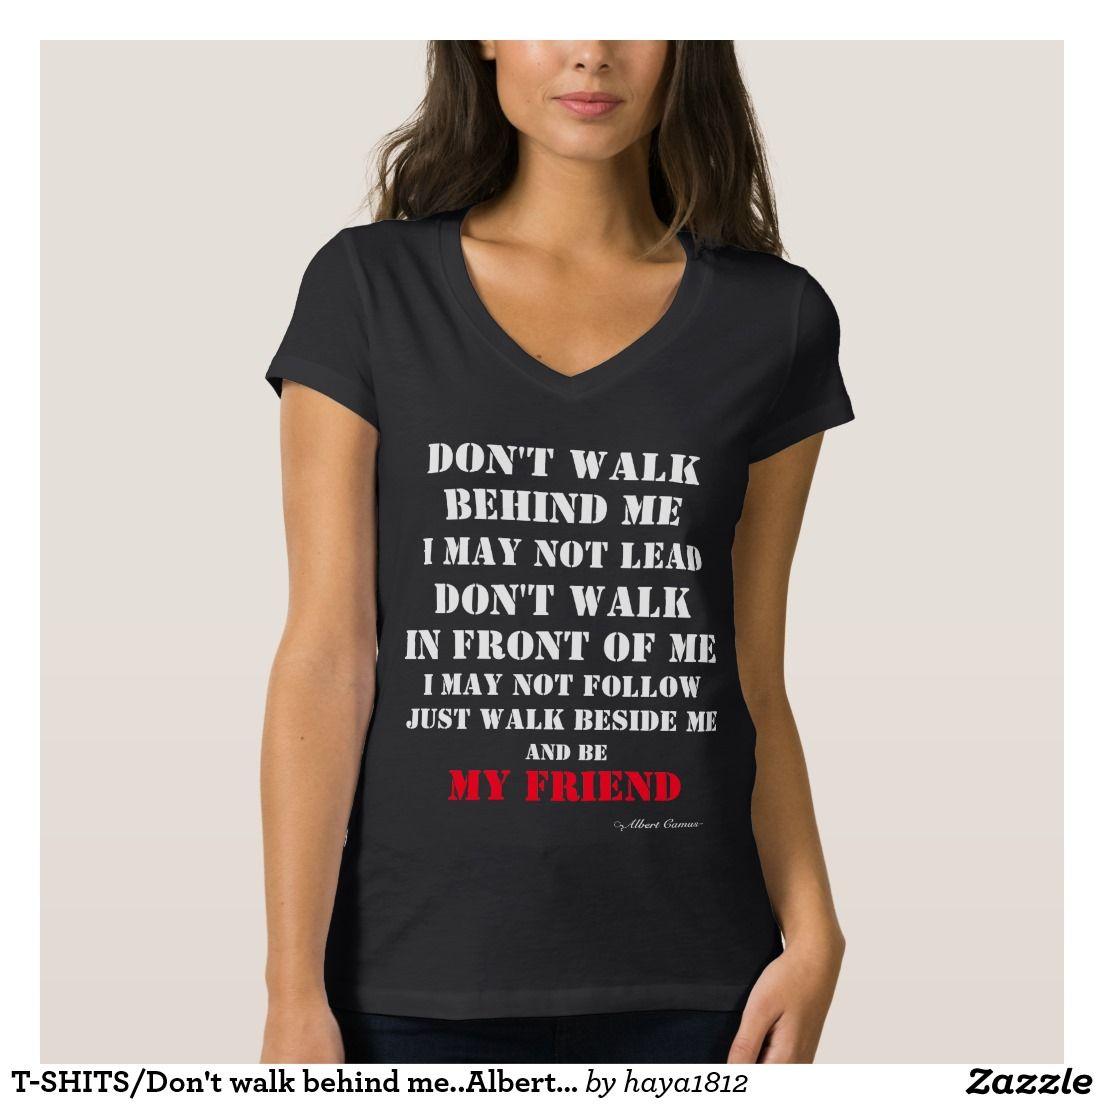 T-SHITS/Don't walk behind me..Albert Camus Quote Tshirts